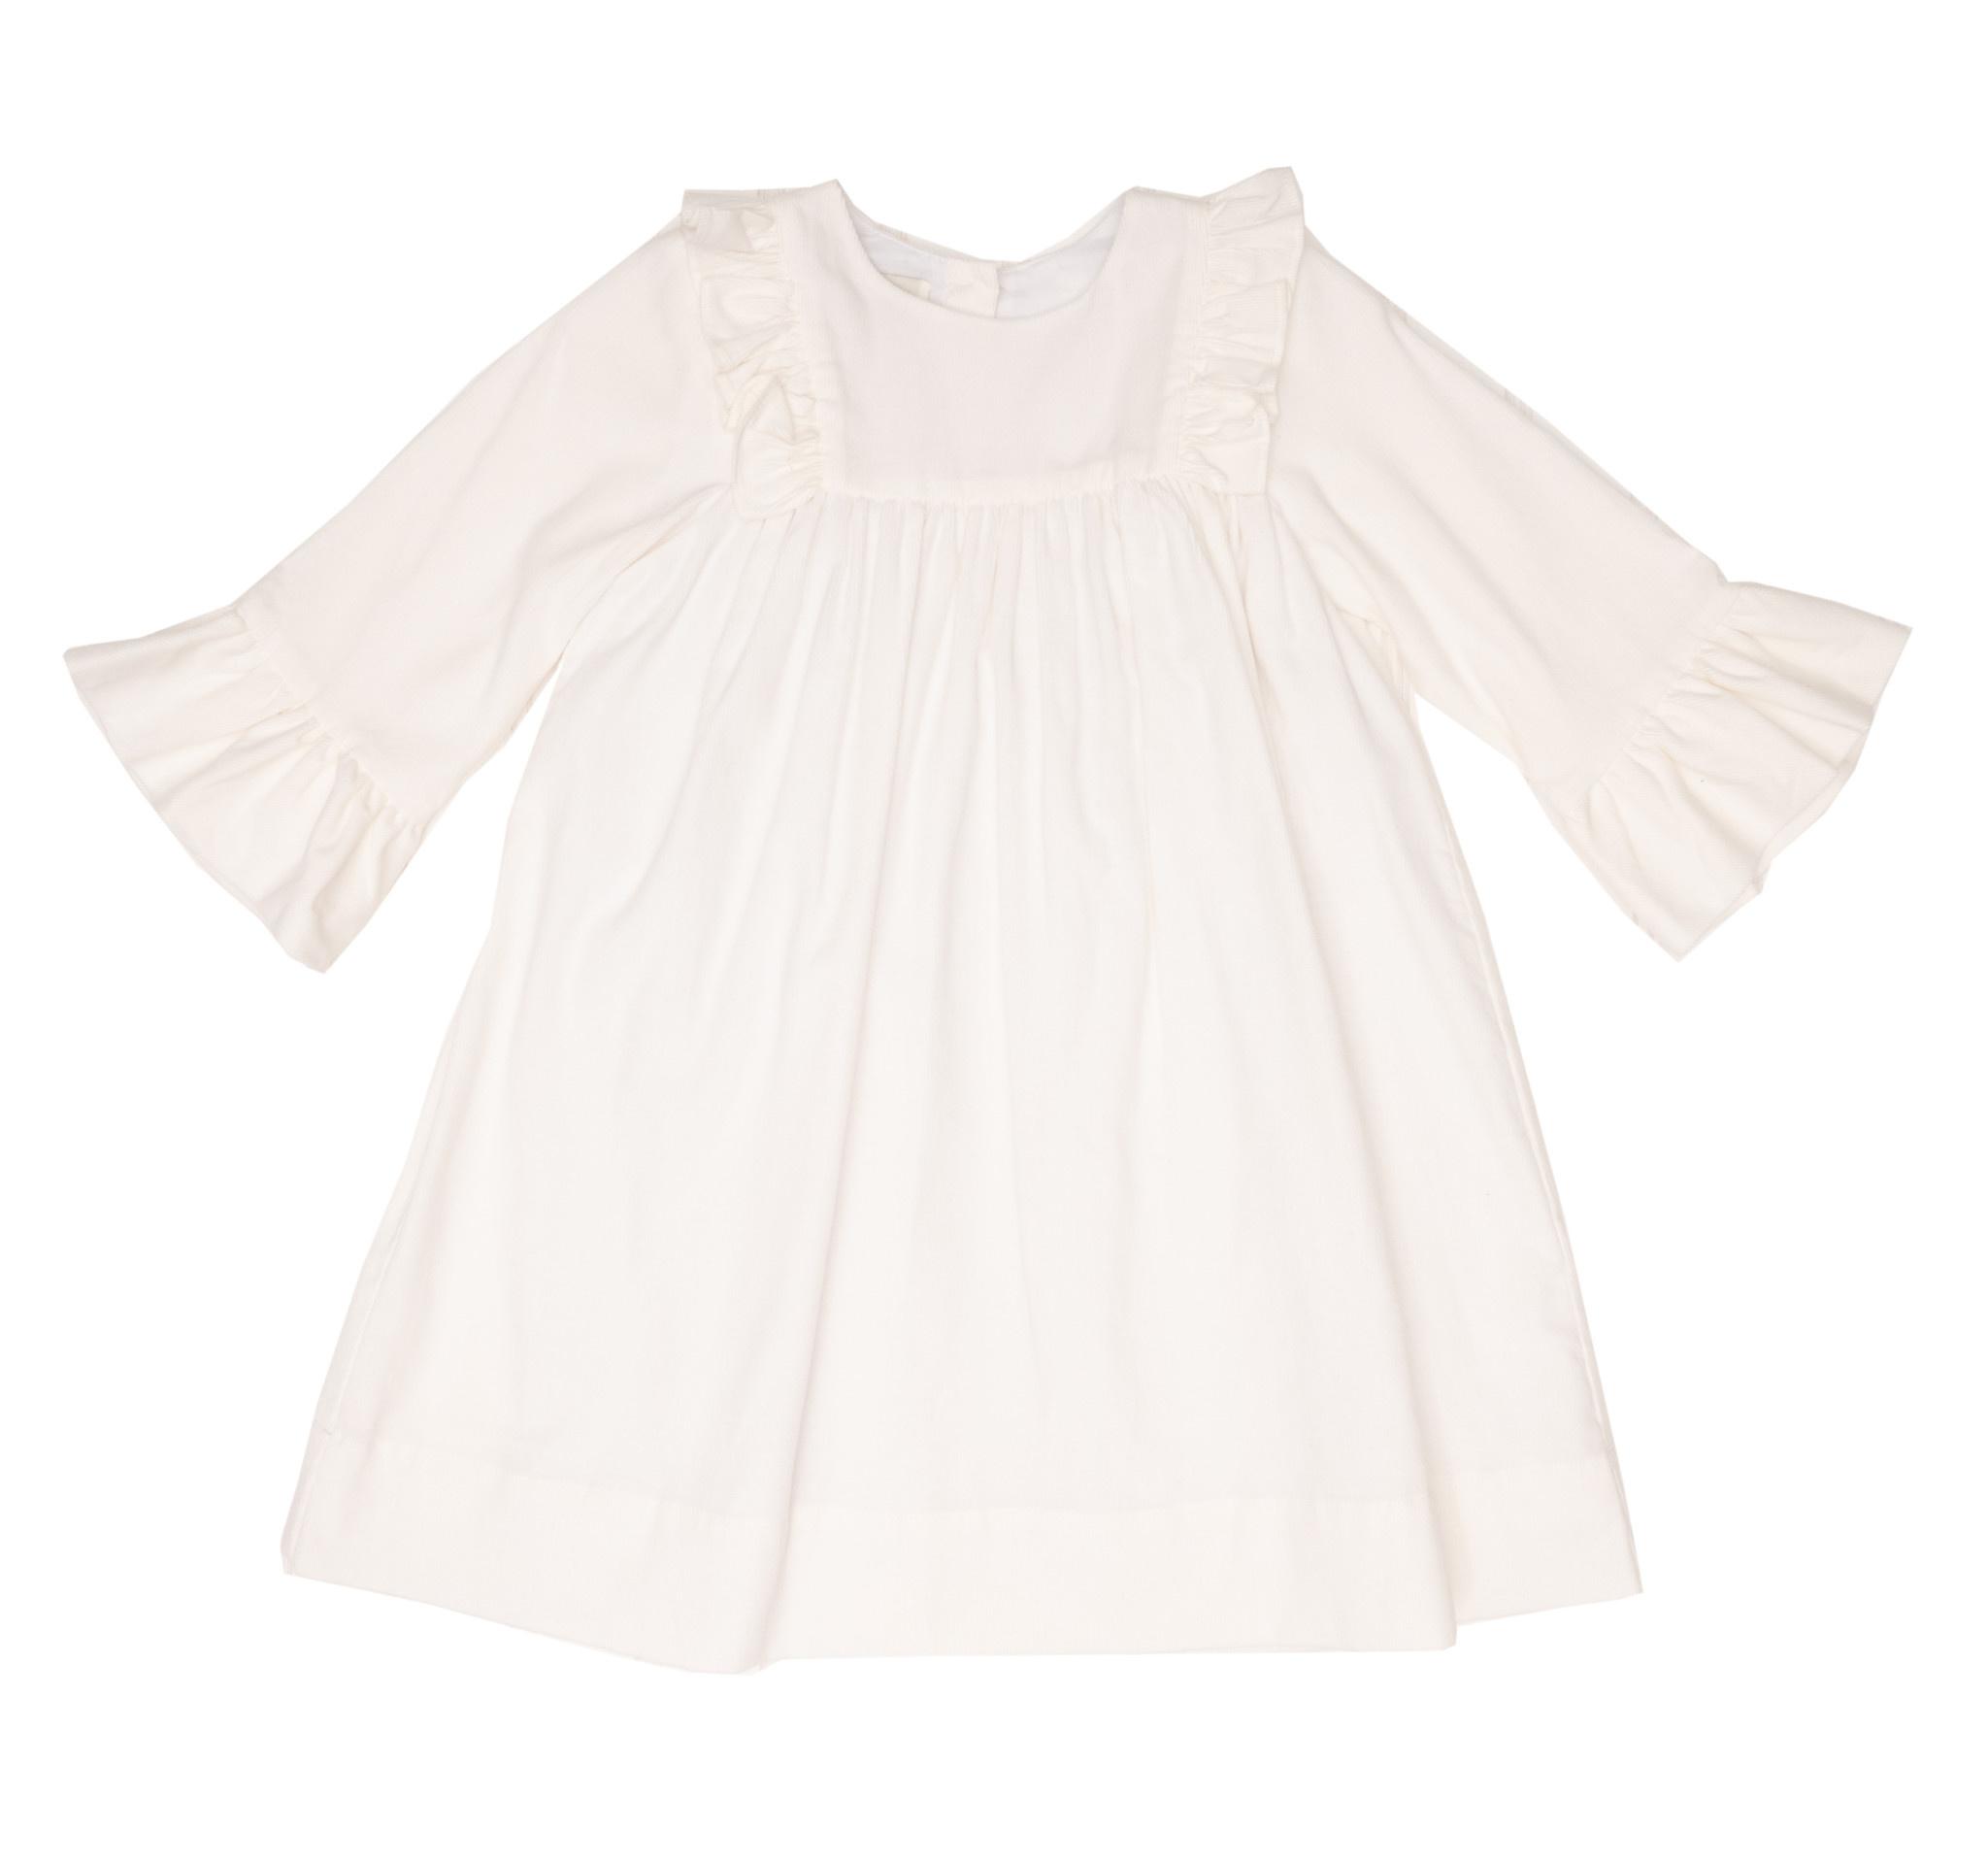 The Oaks Apparel Millie Winter White Dress